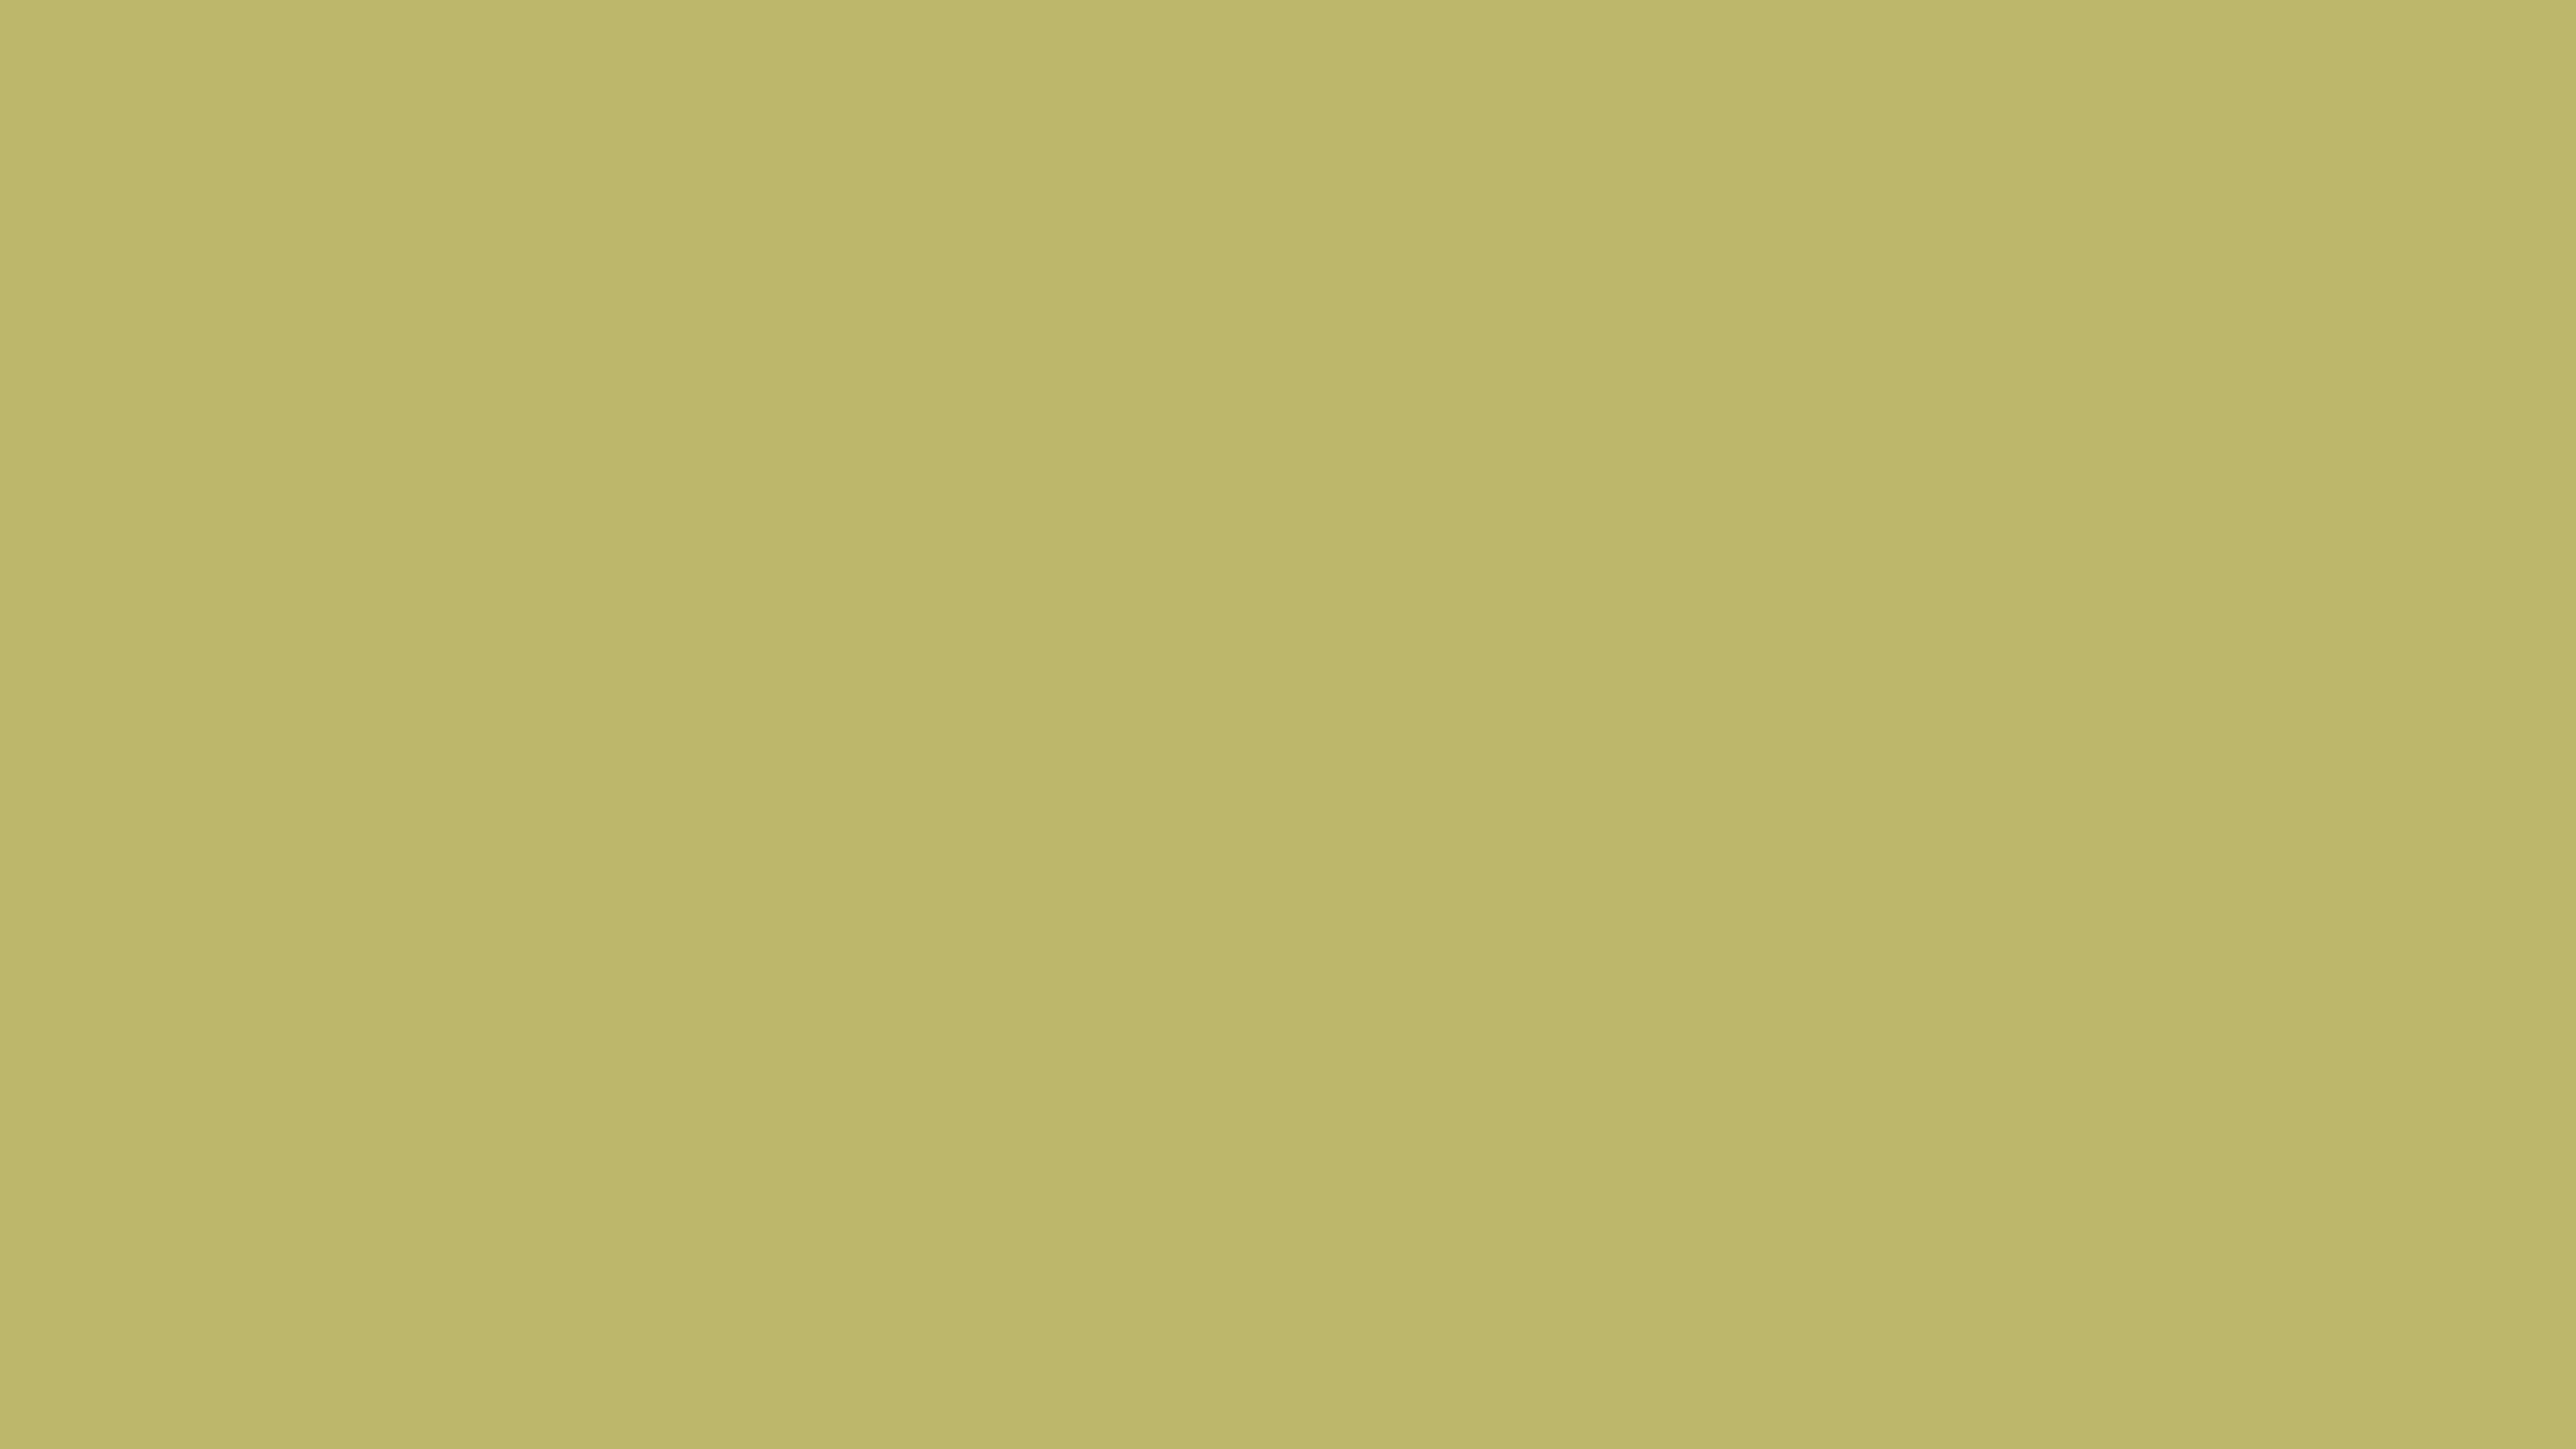 3840x2160 Dark Khaki Solid Color Background